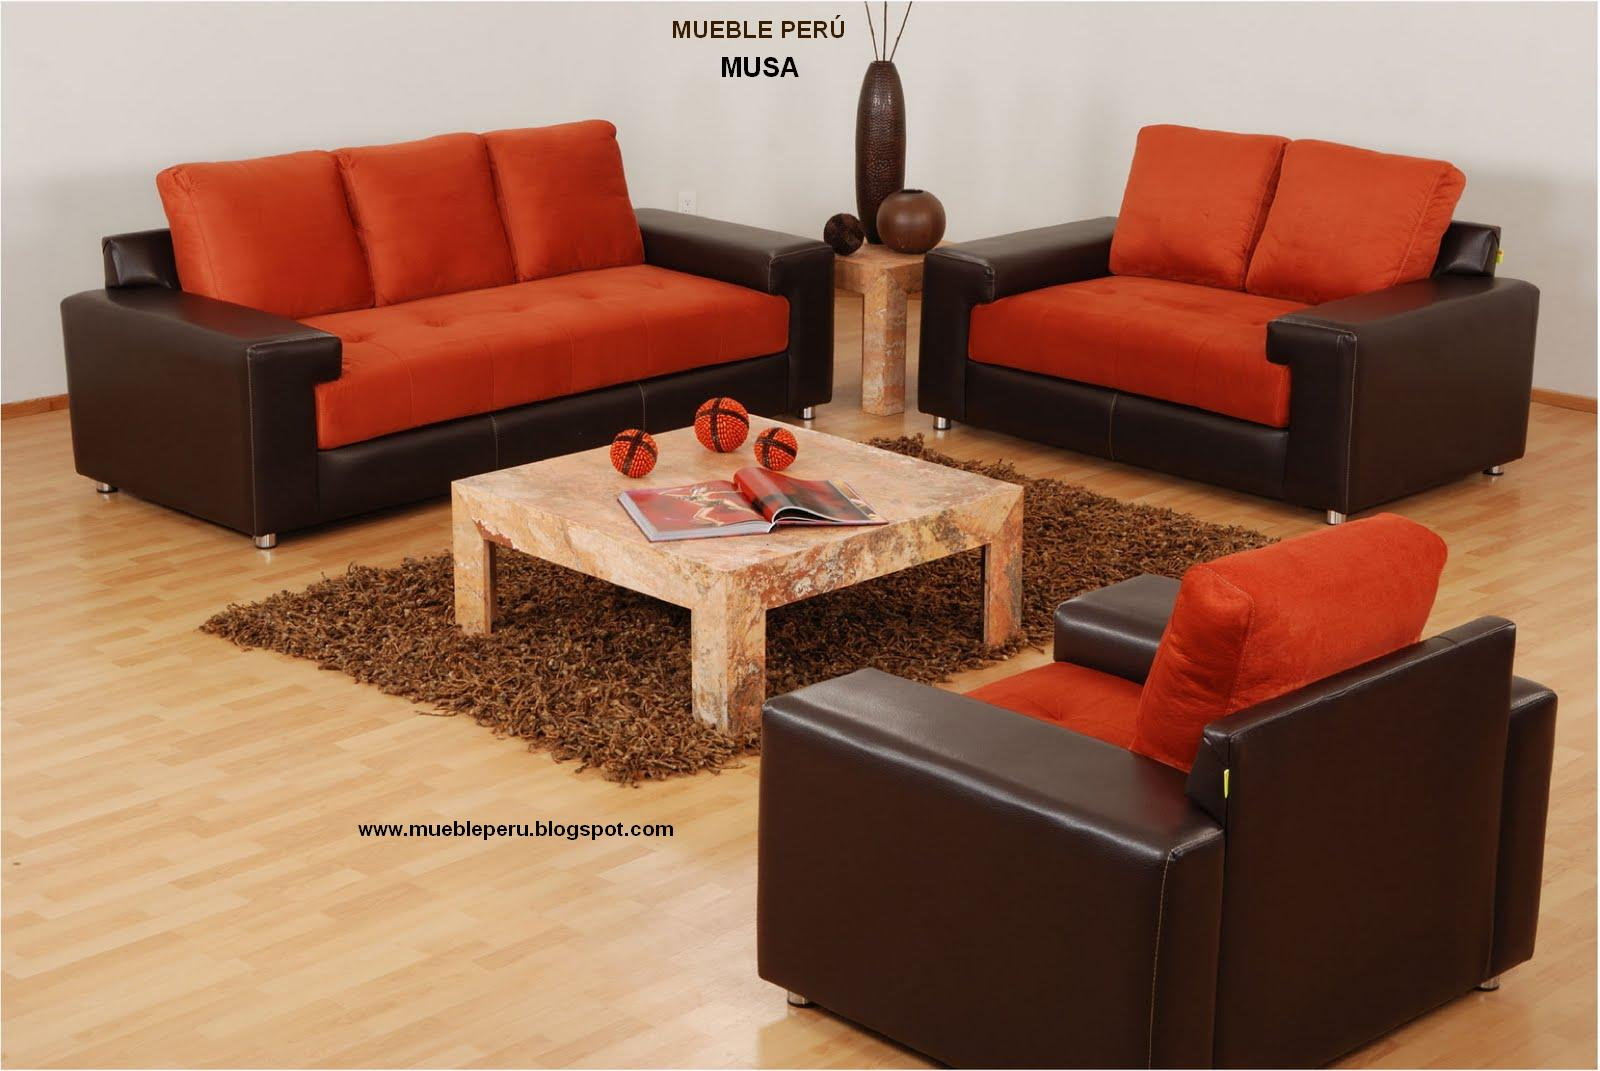 Muebles pegaso muebles en microfibra variedades for Muebles modernos de madera para sala